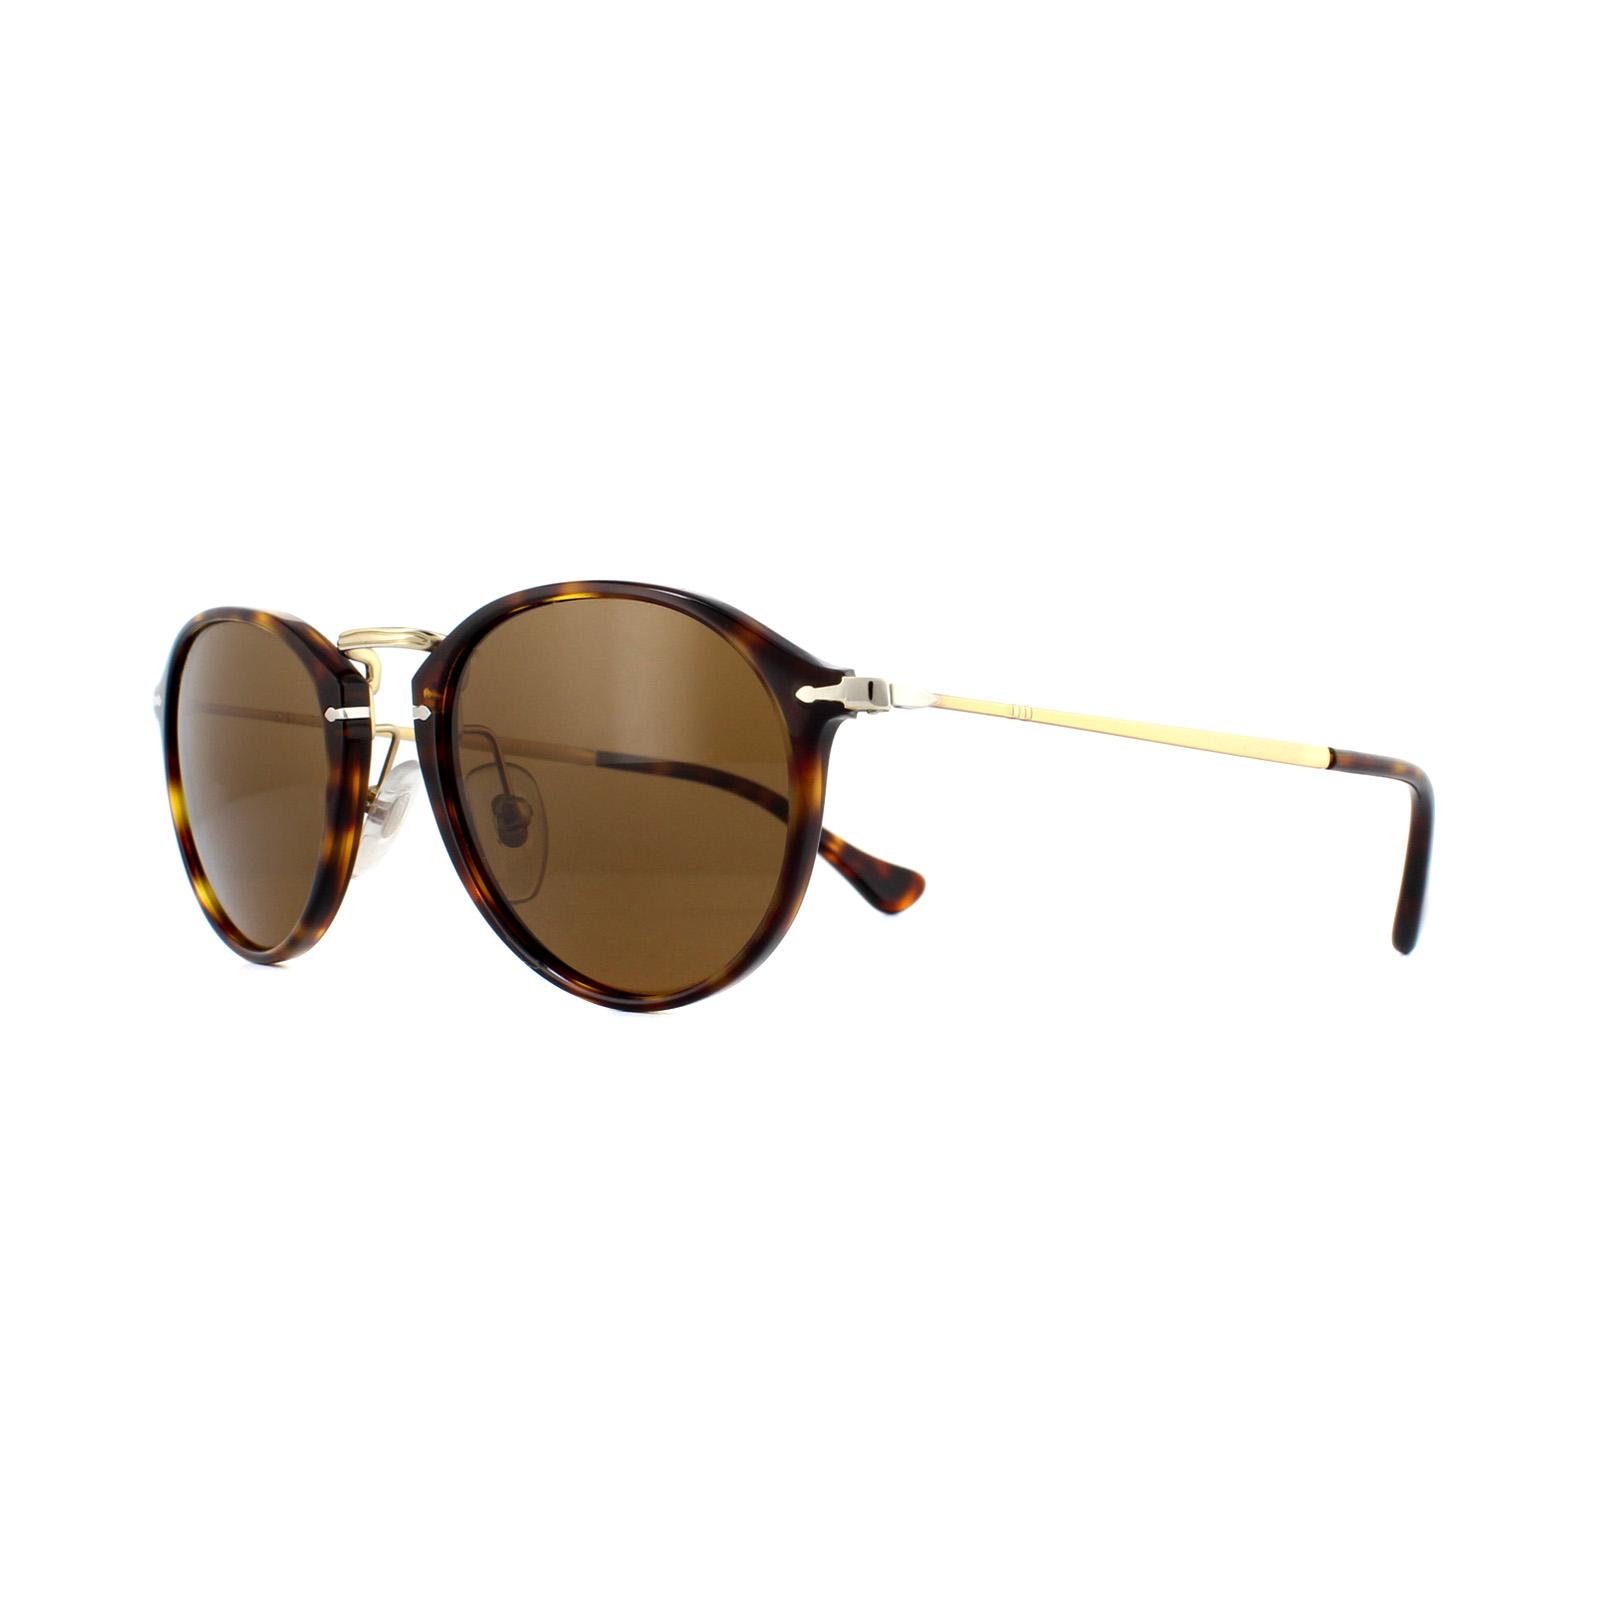 939ca17730 Sentinel Persol Sunglasses 3046 24 57 Havana Crystal Brown Polarized